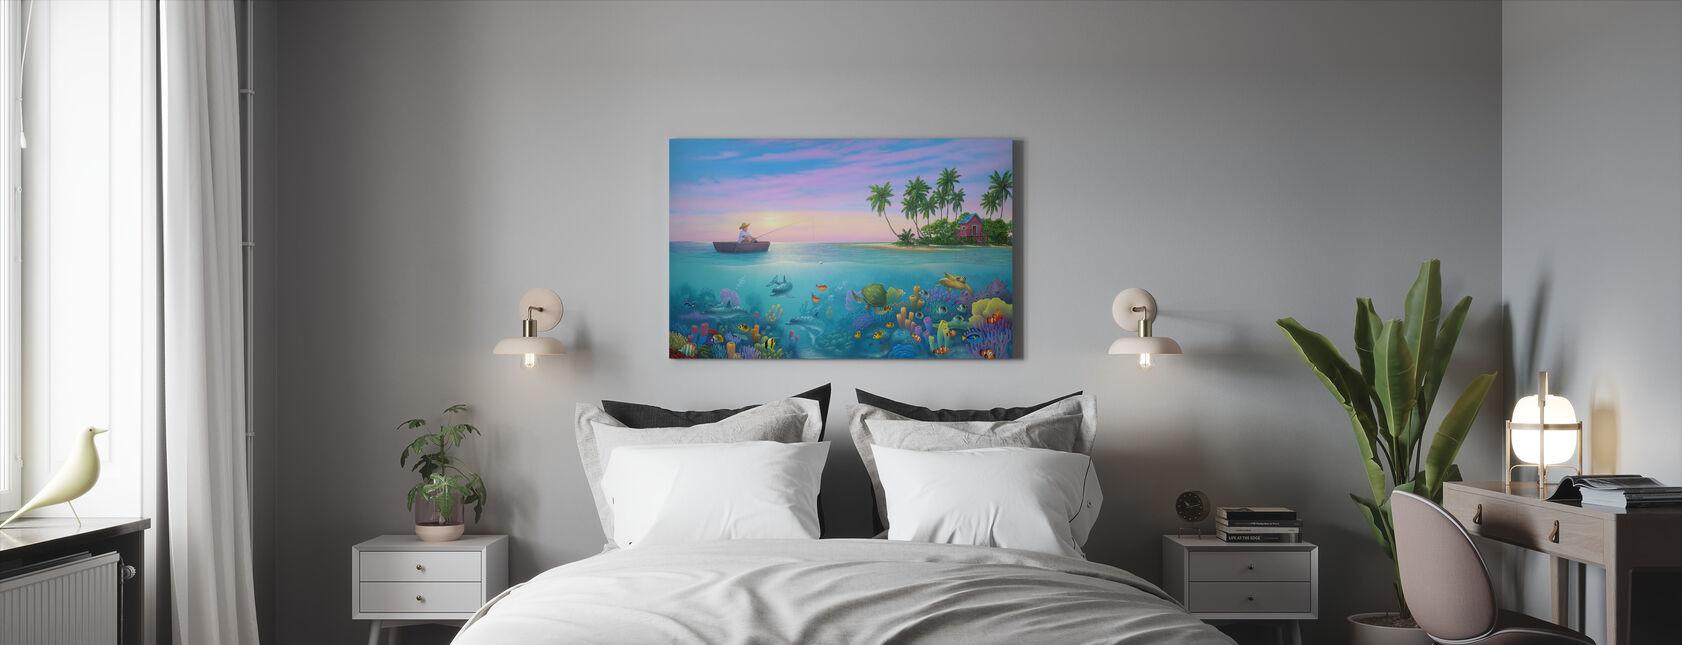 Fiske i Paradise - Lerretsbilde - Soverom